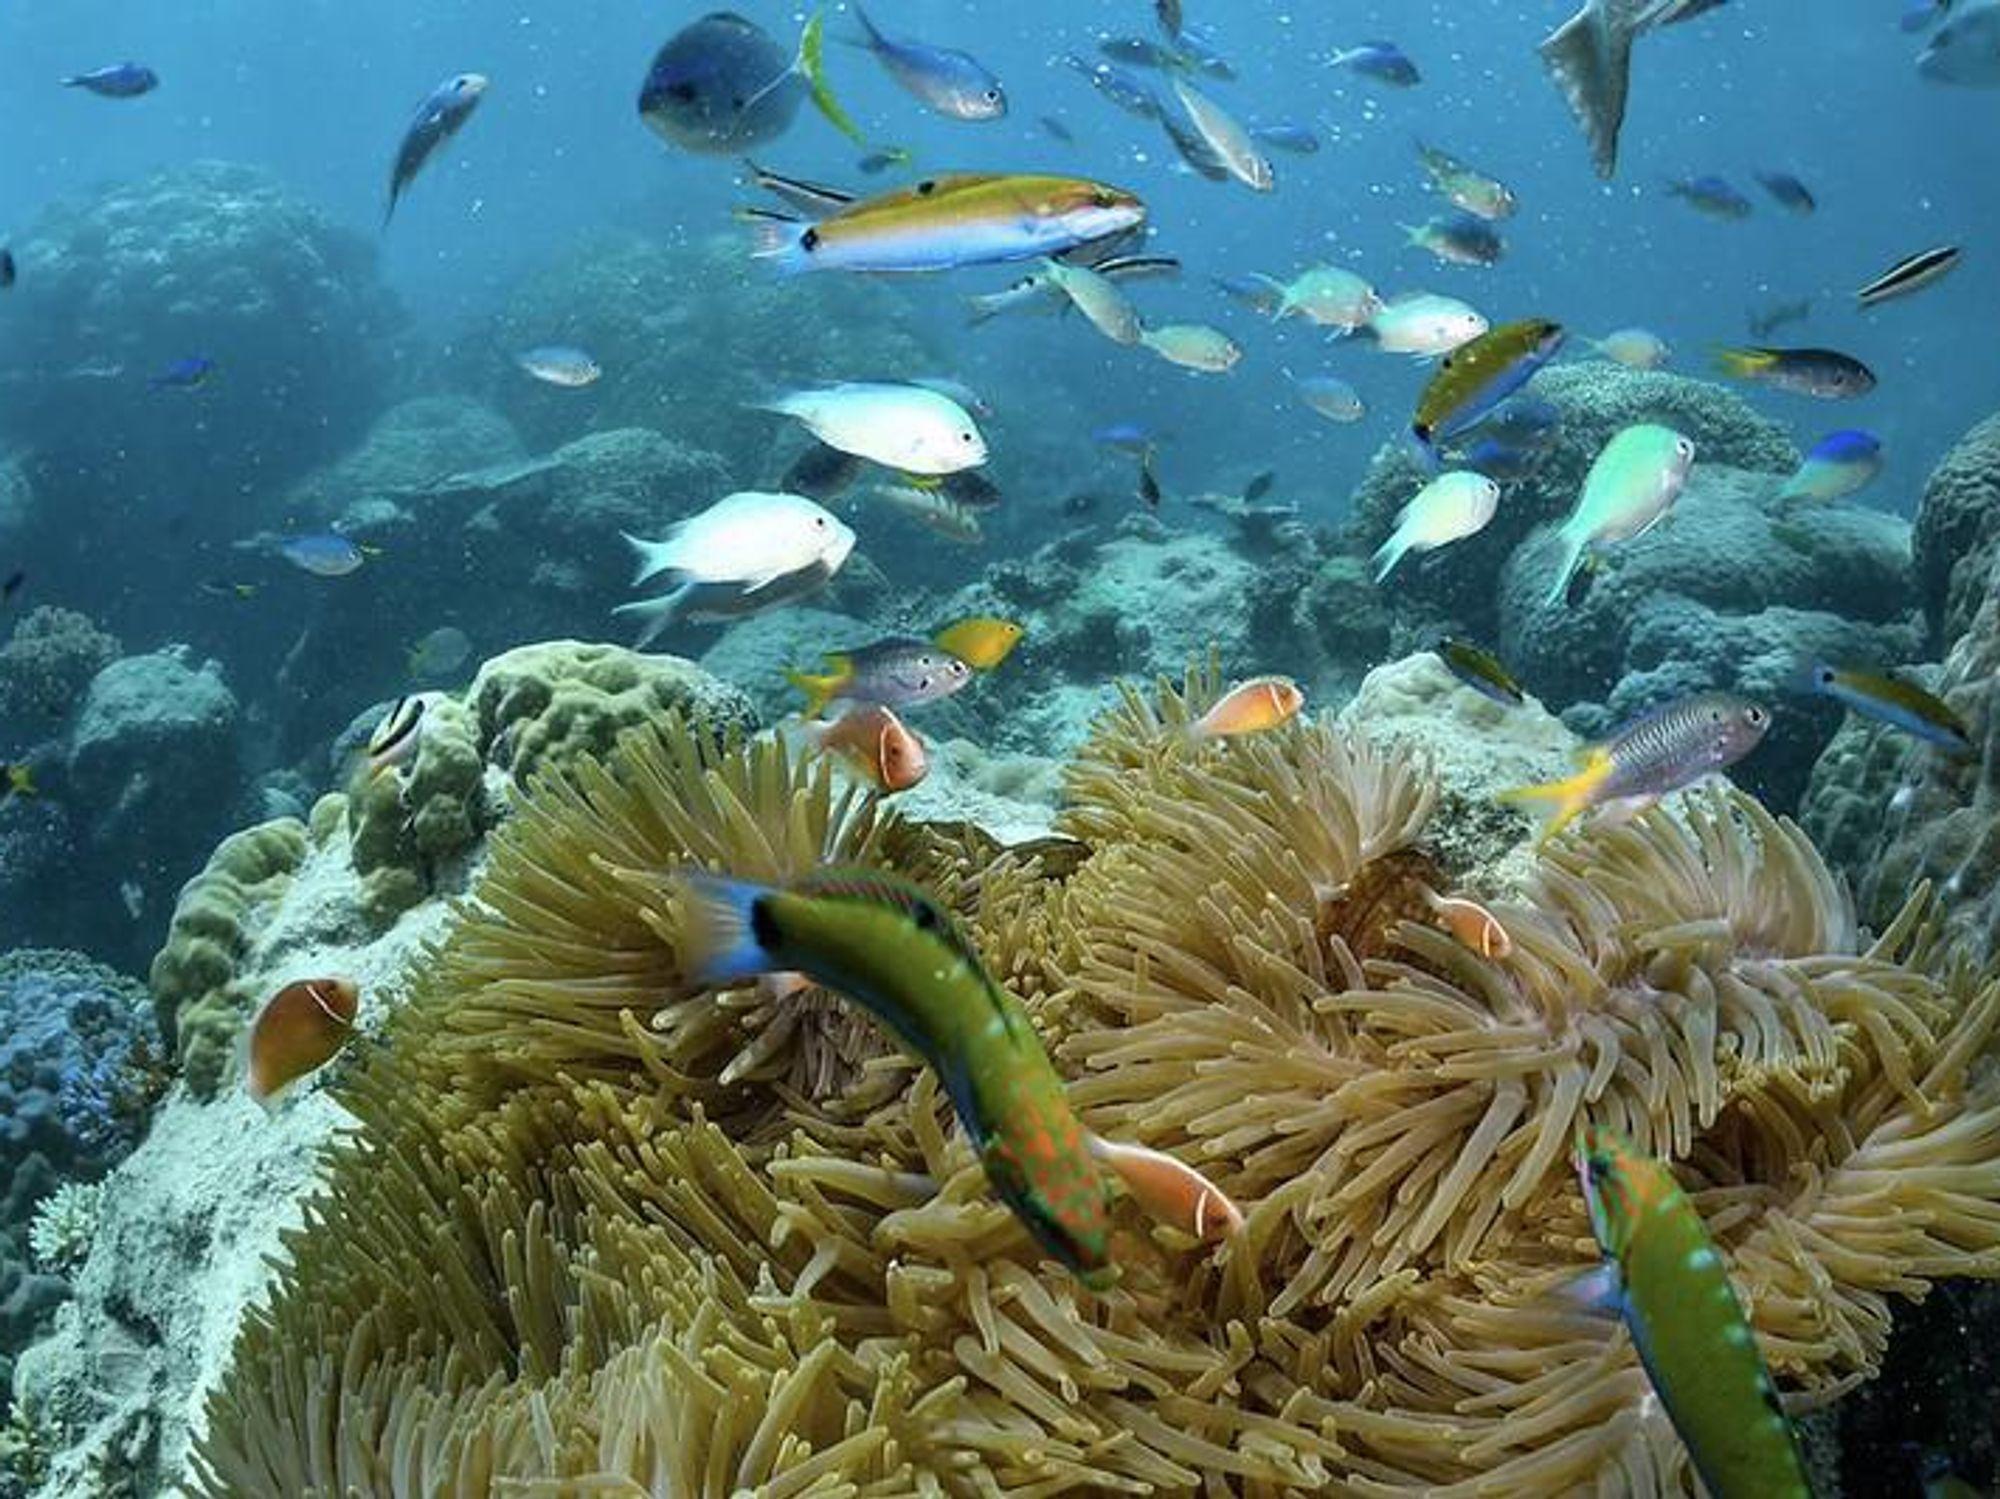 Mining billionaire hopes multi-million dollar research centre will reverse reef's decline